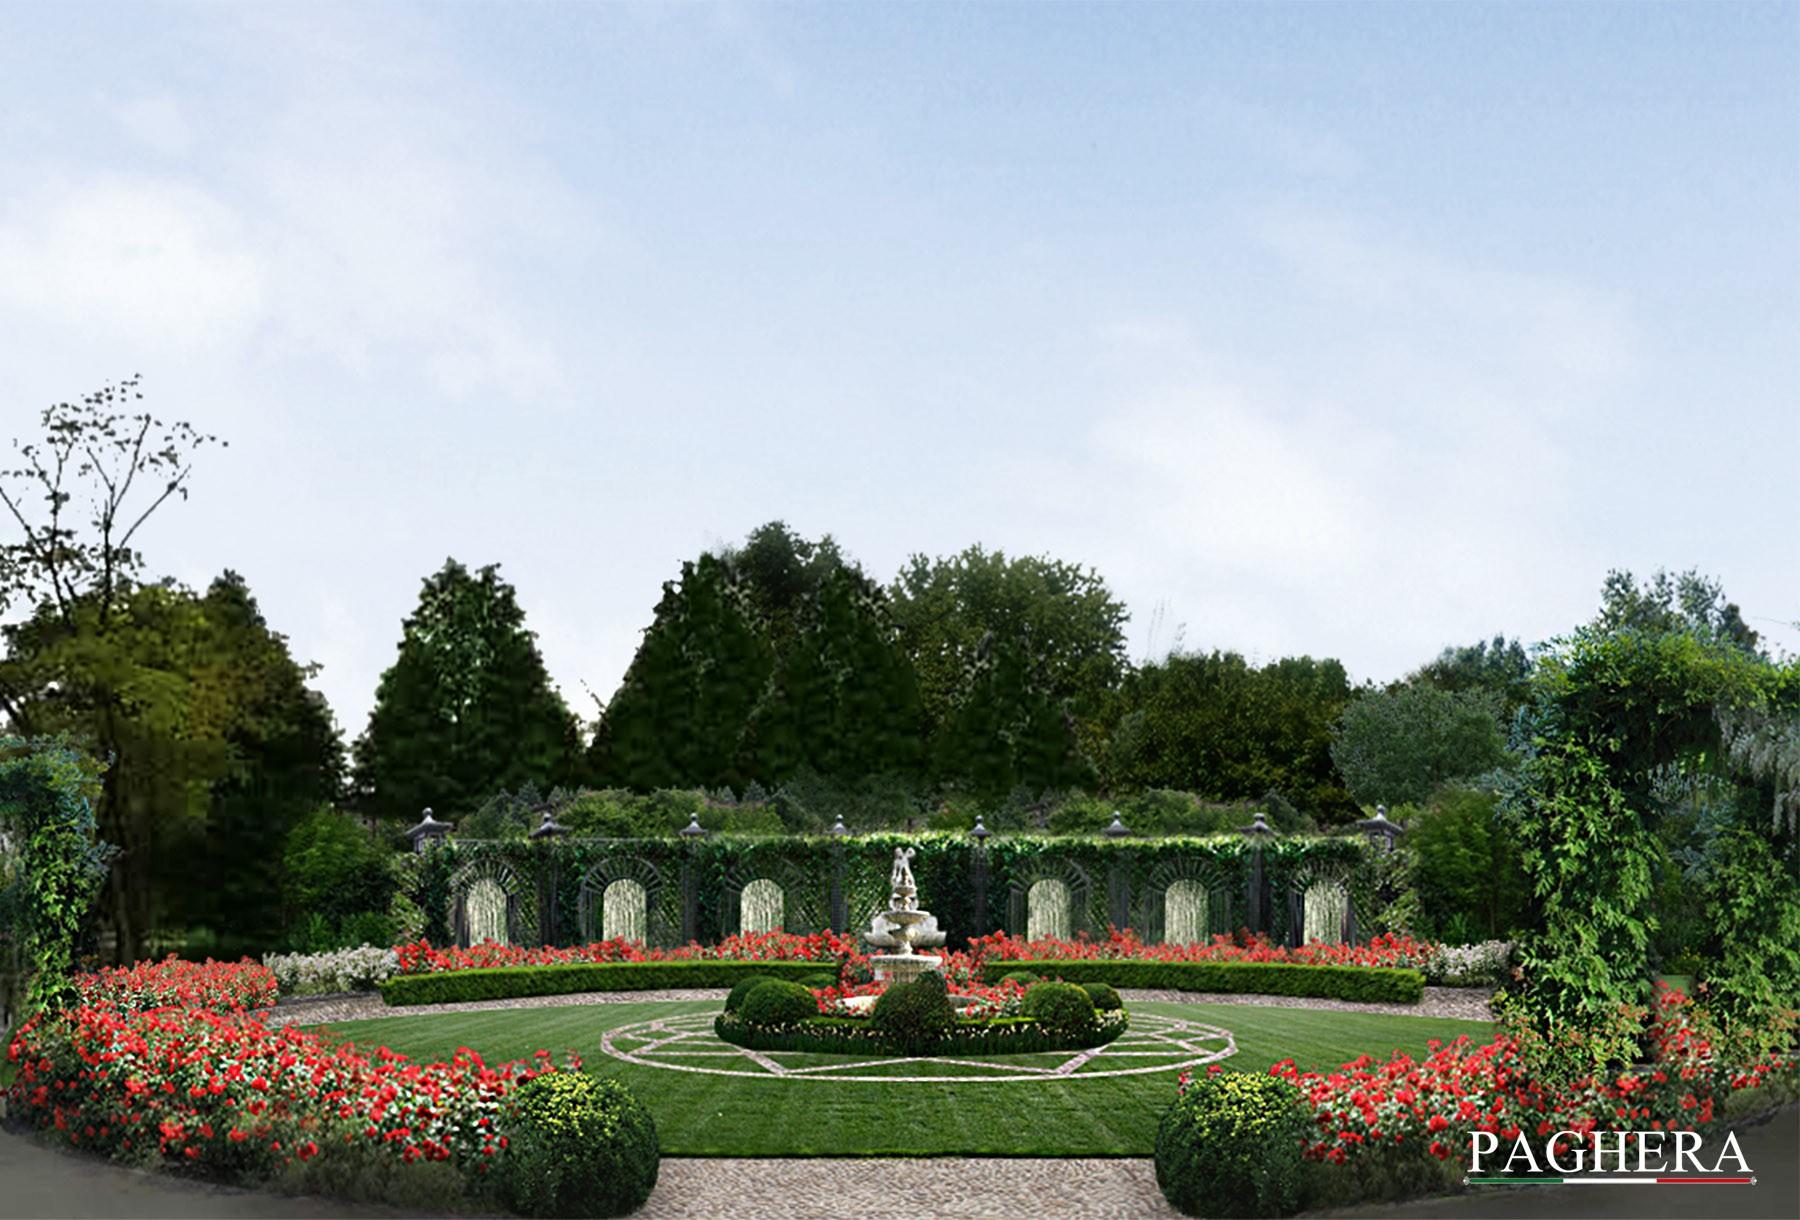 An Italian garden in China - Public Green Areas & Amusement Parks